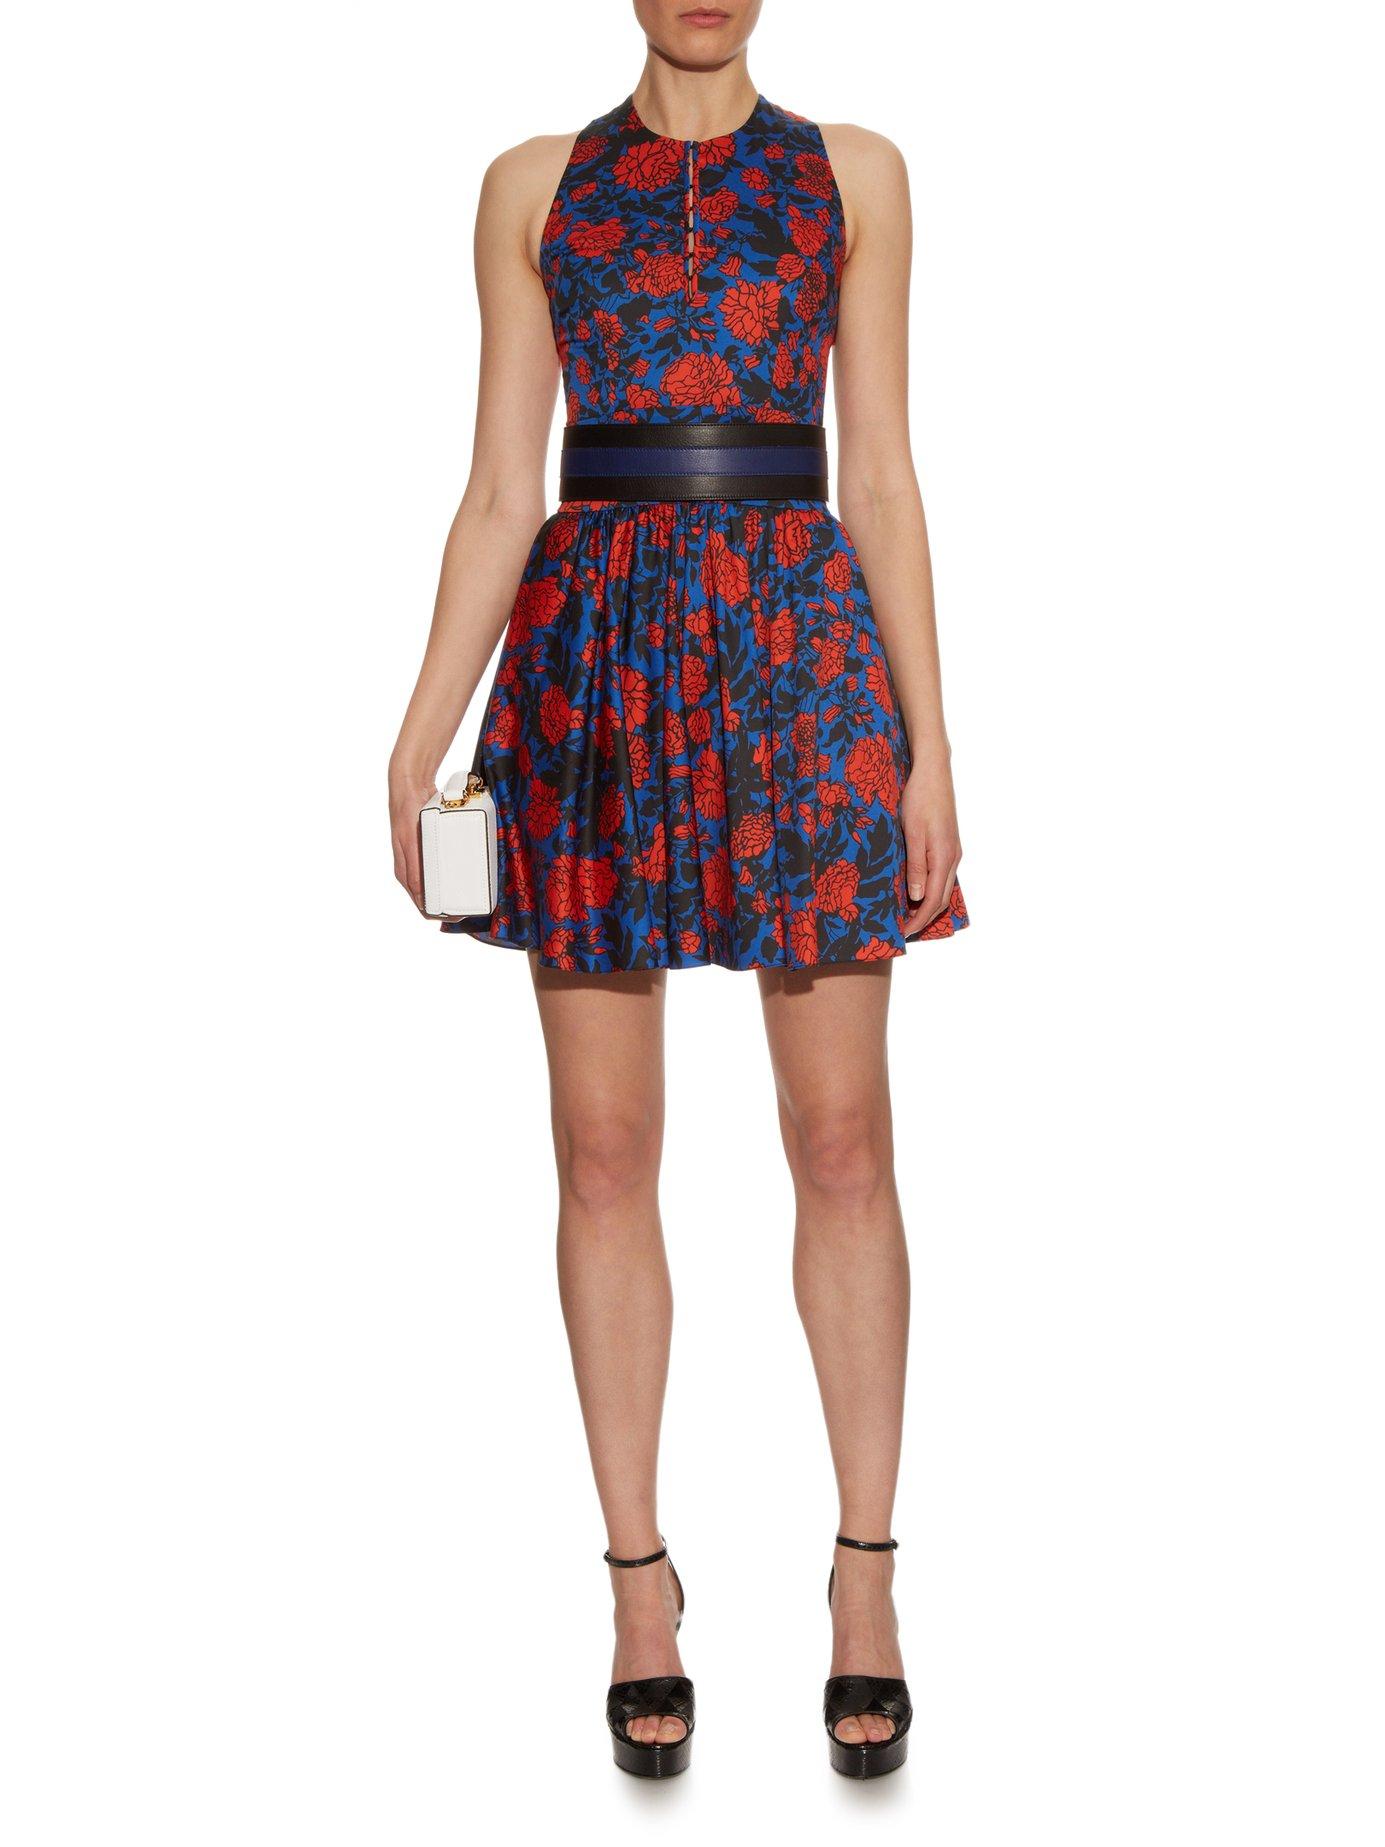 Jeanne floral-print dress by Sophie Theallet